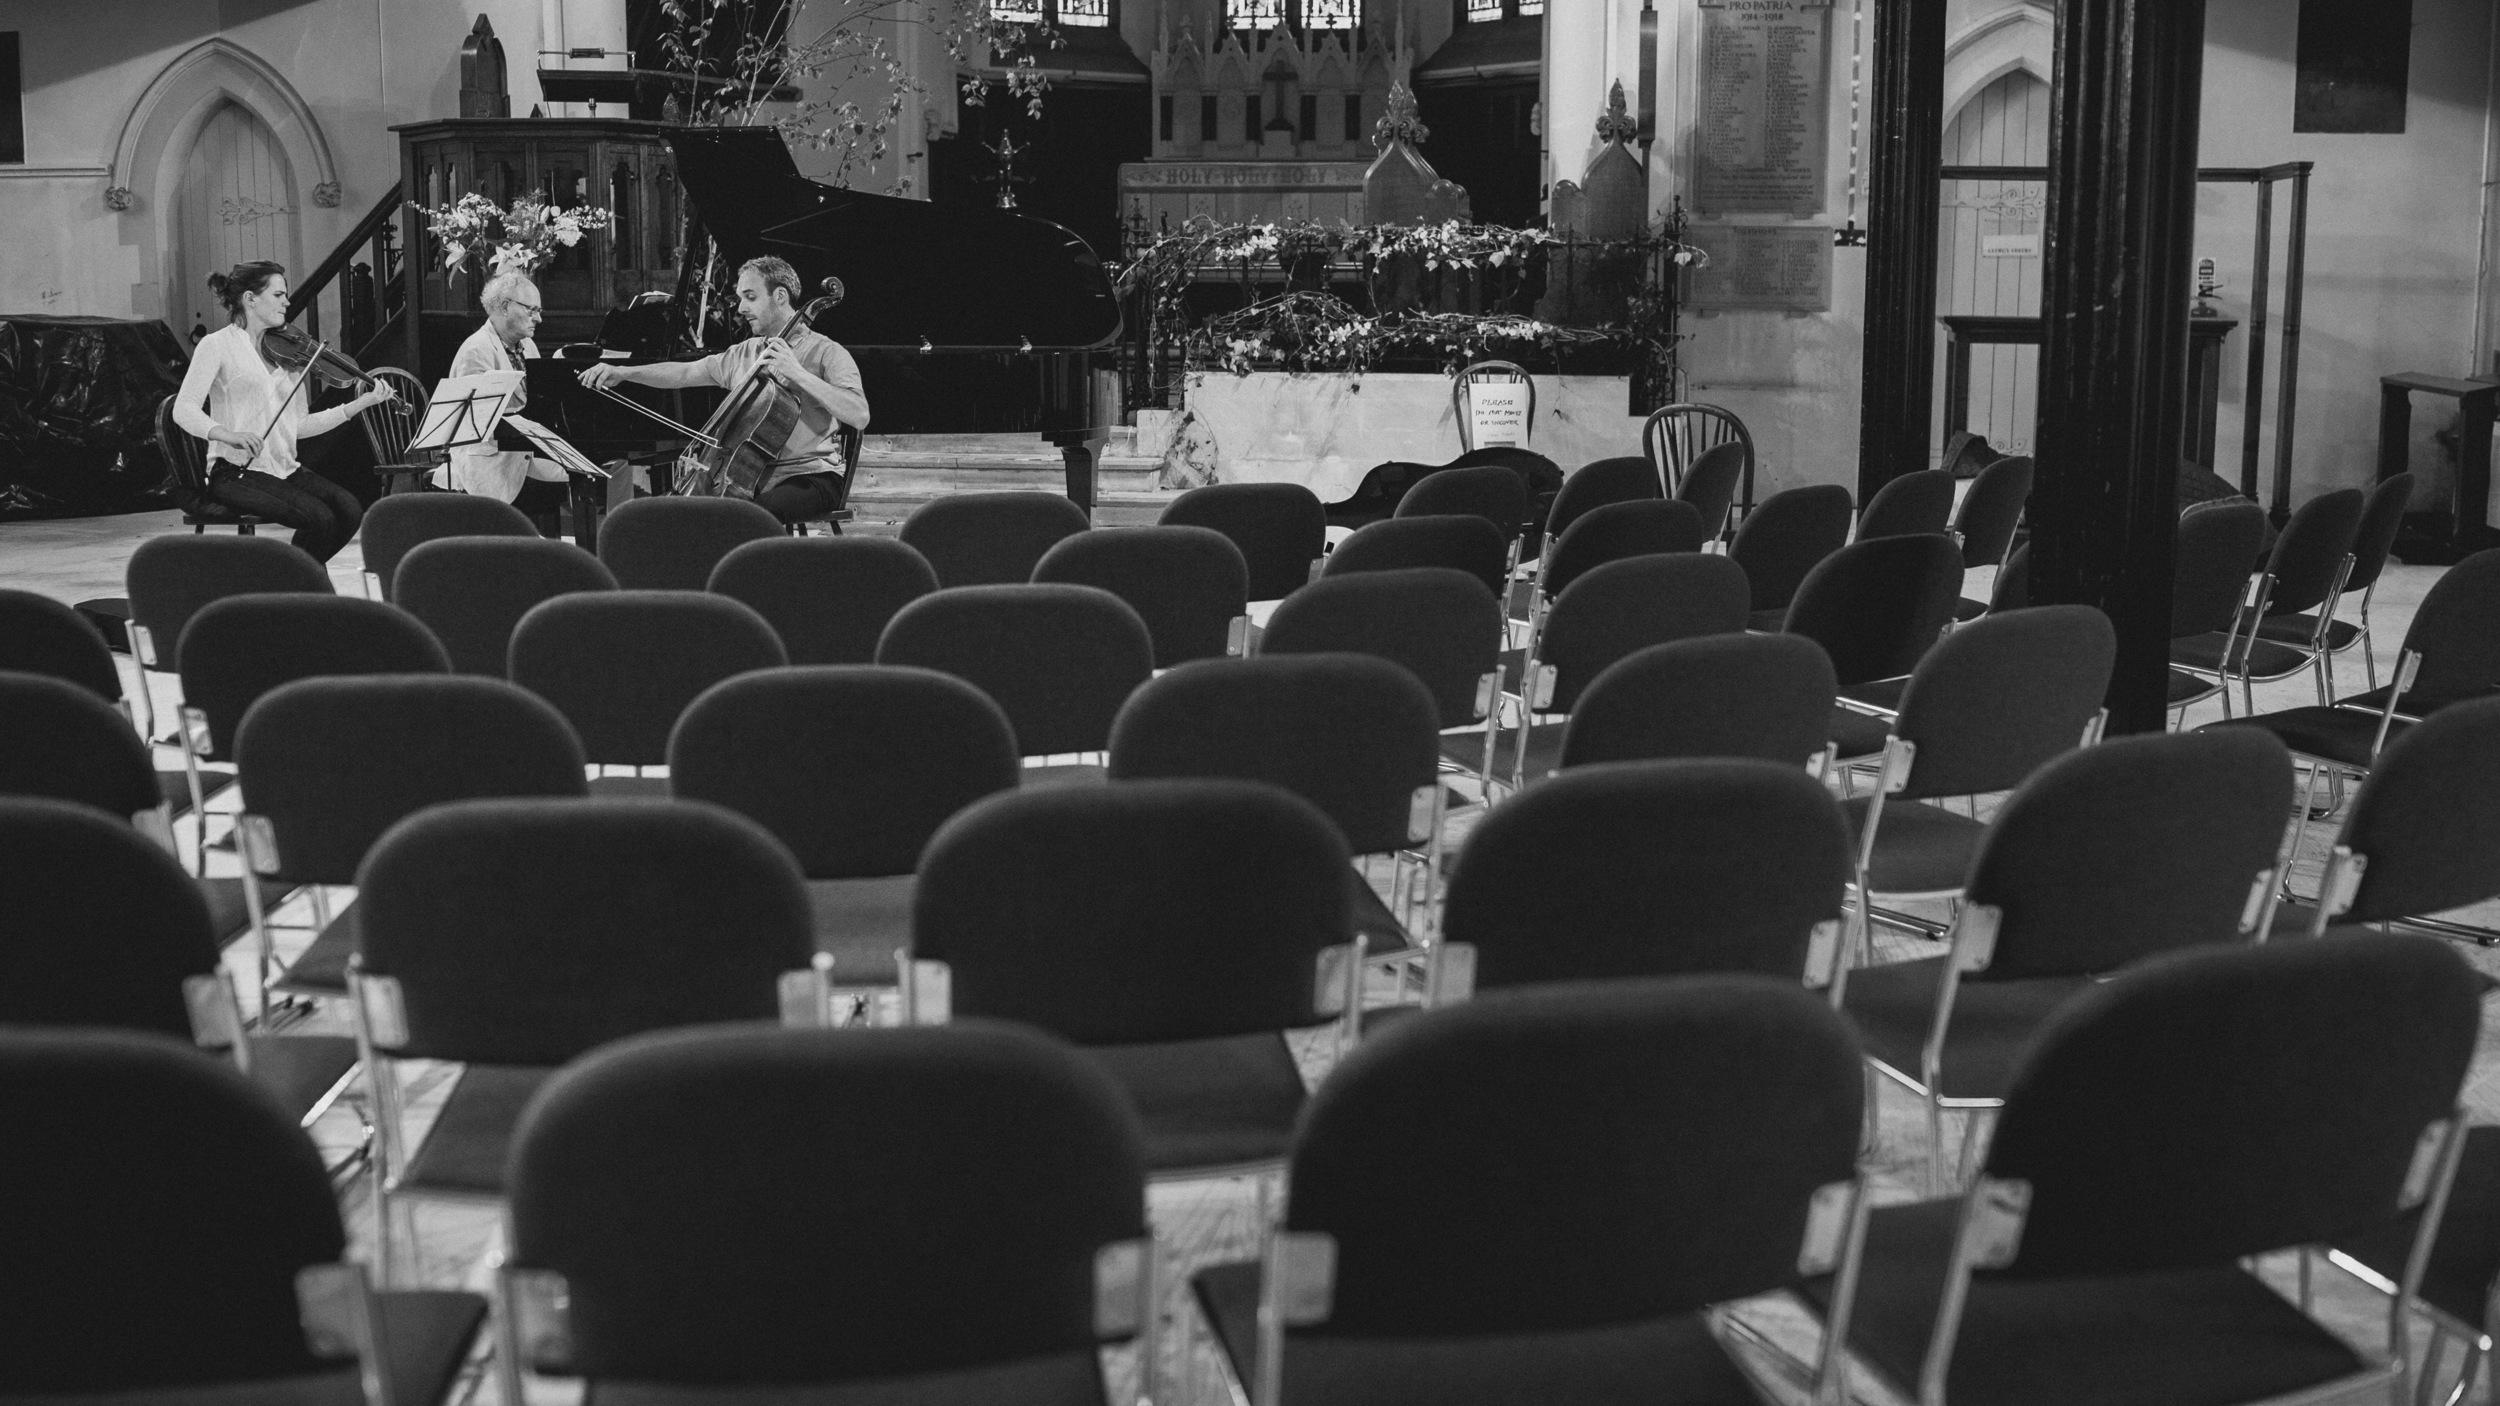 Beatrice Philips, Bengt Forsberg and Pierre Doumenge rehearsing Haydn Piano Trio No. 36 in E-Flat Major.